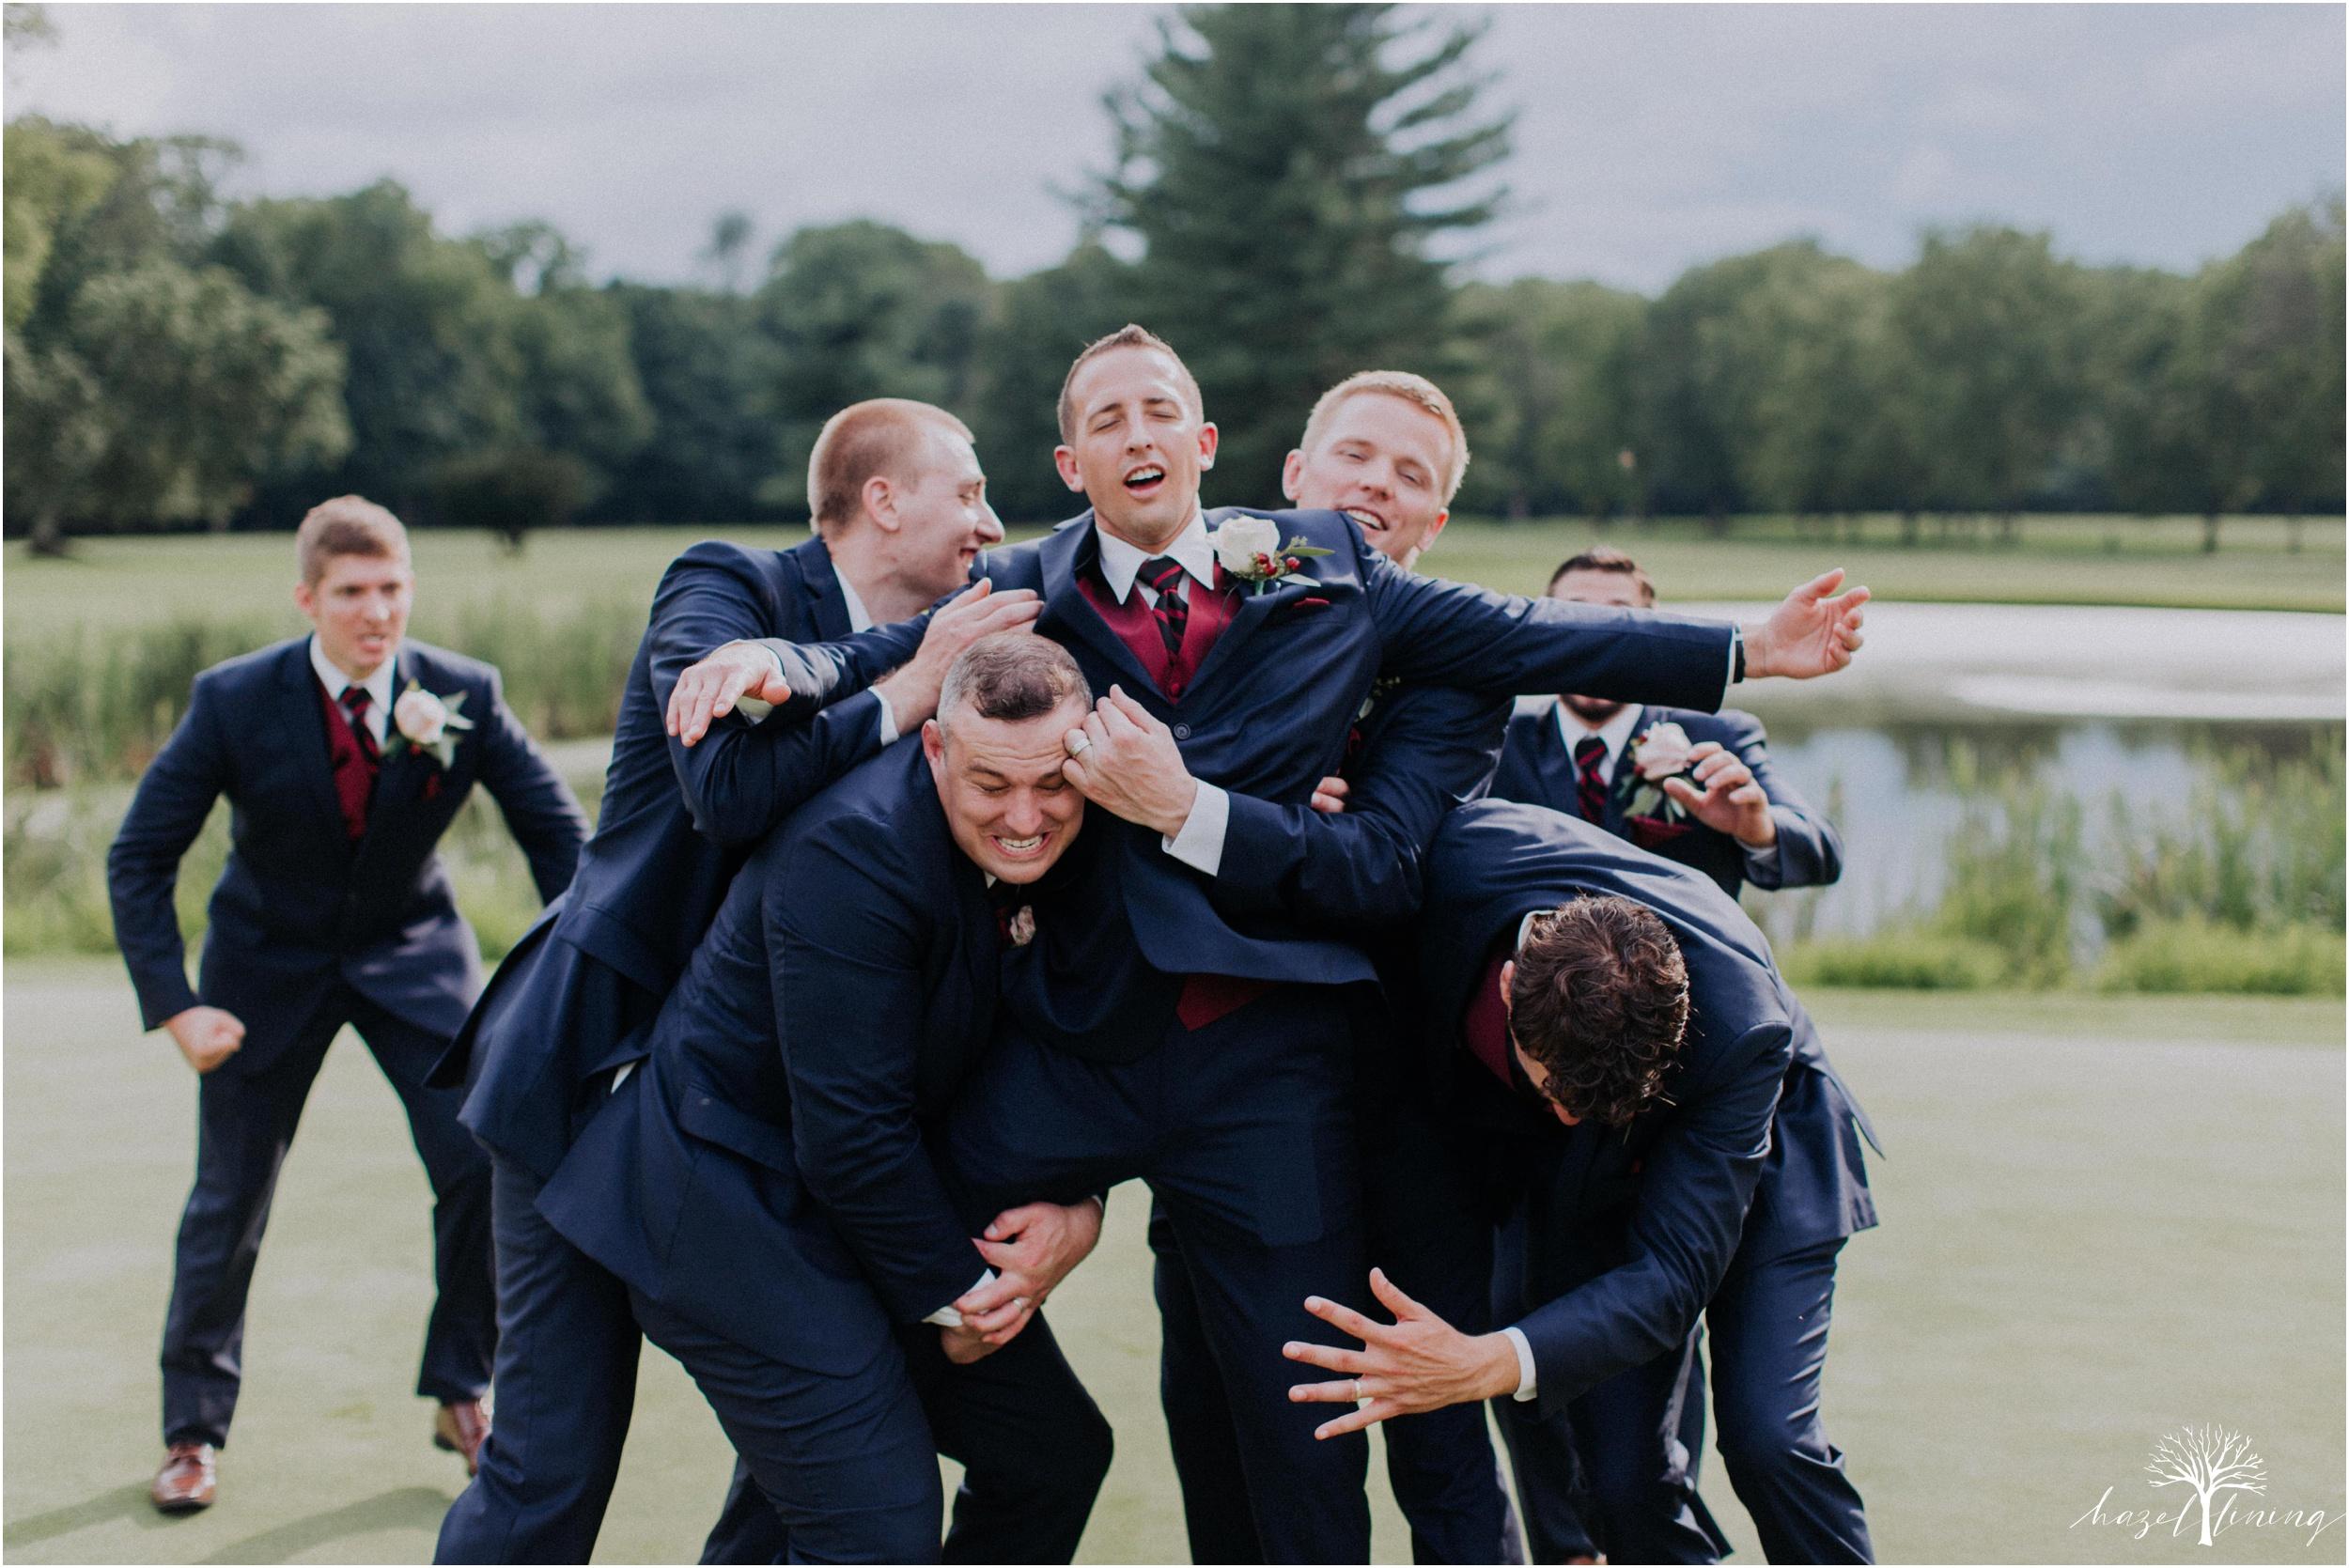 jonathan-weibel-becky-haywood-loft-at-sweetwater-cc-pennsburg-pennsylvania-rainy-day-summer-wedding-hazel-lining-travel-wedding-elopement-photography_0066.jpg